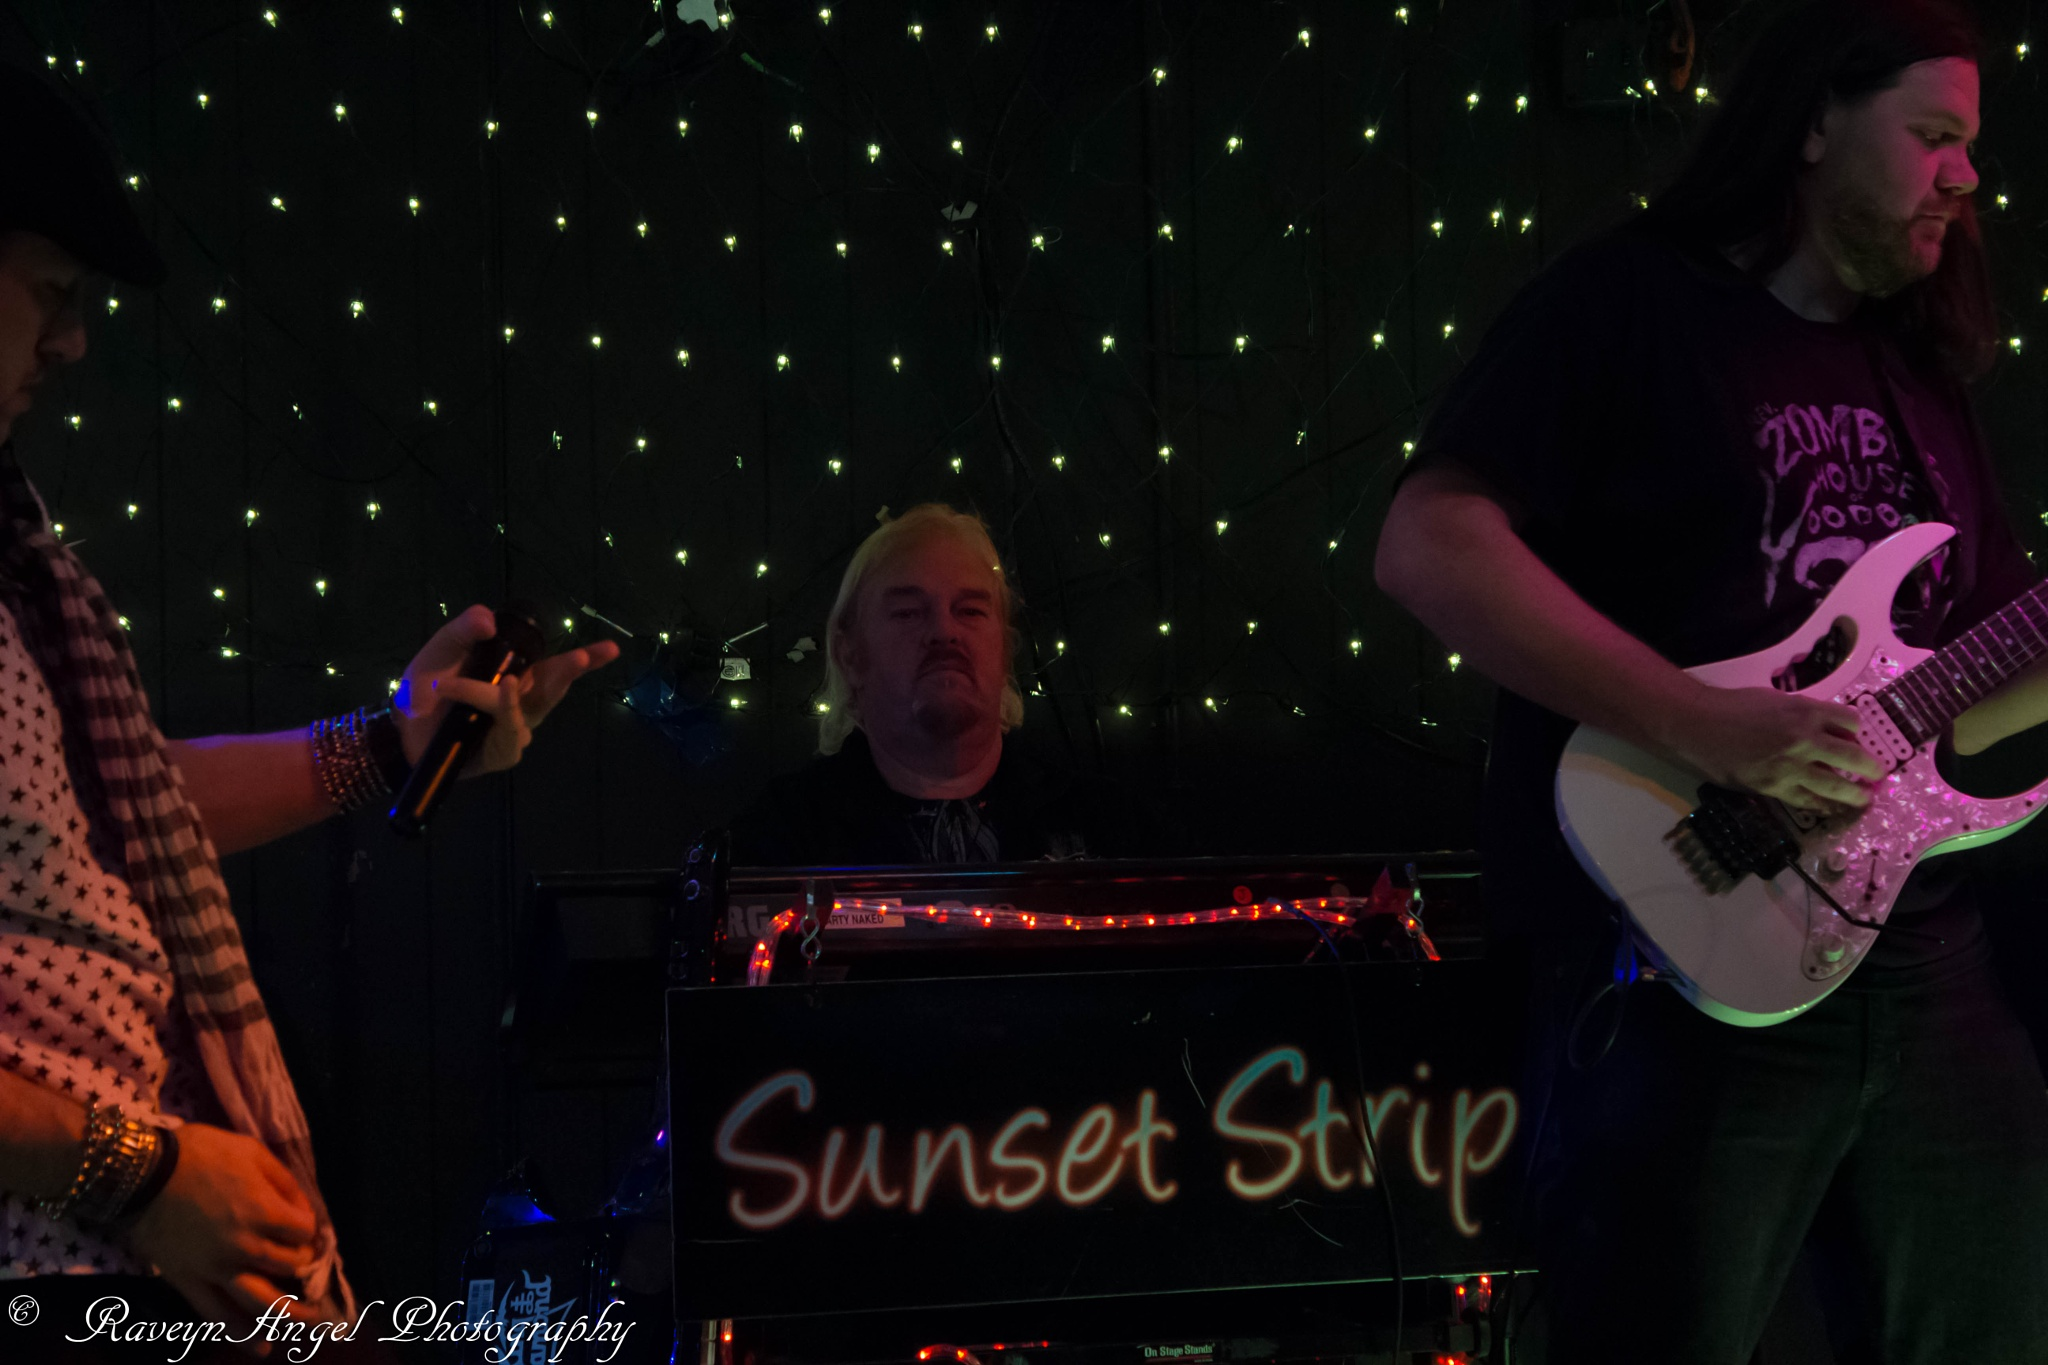 Sunset Strip by RaveynAngel